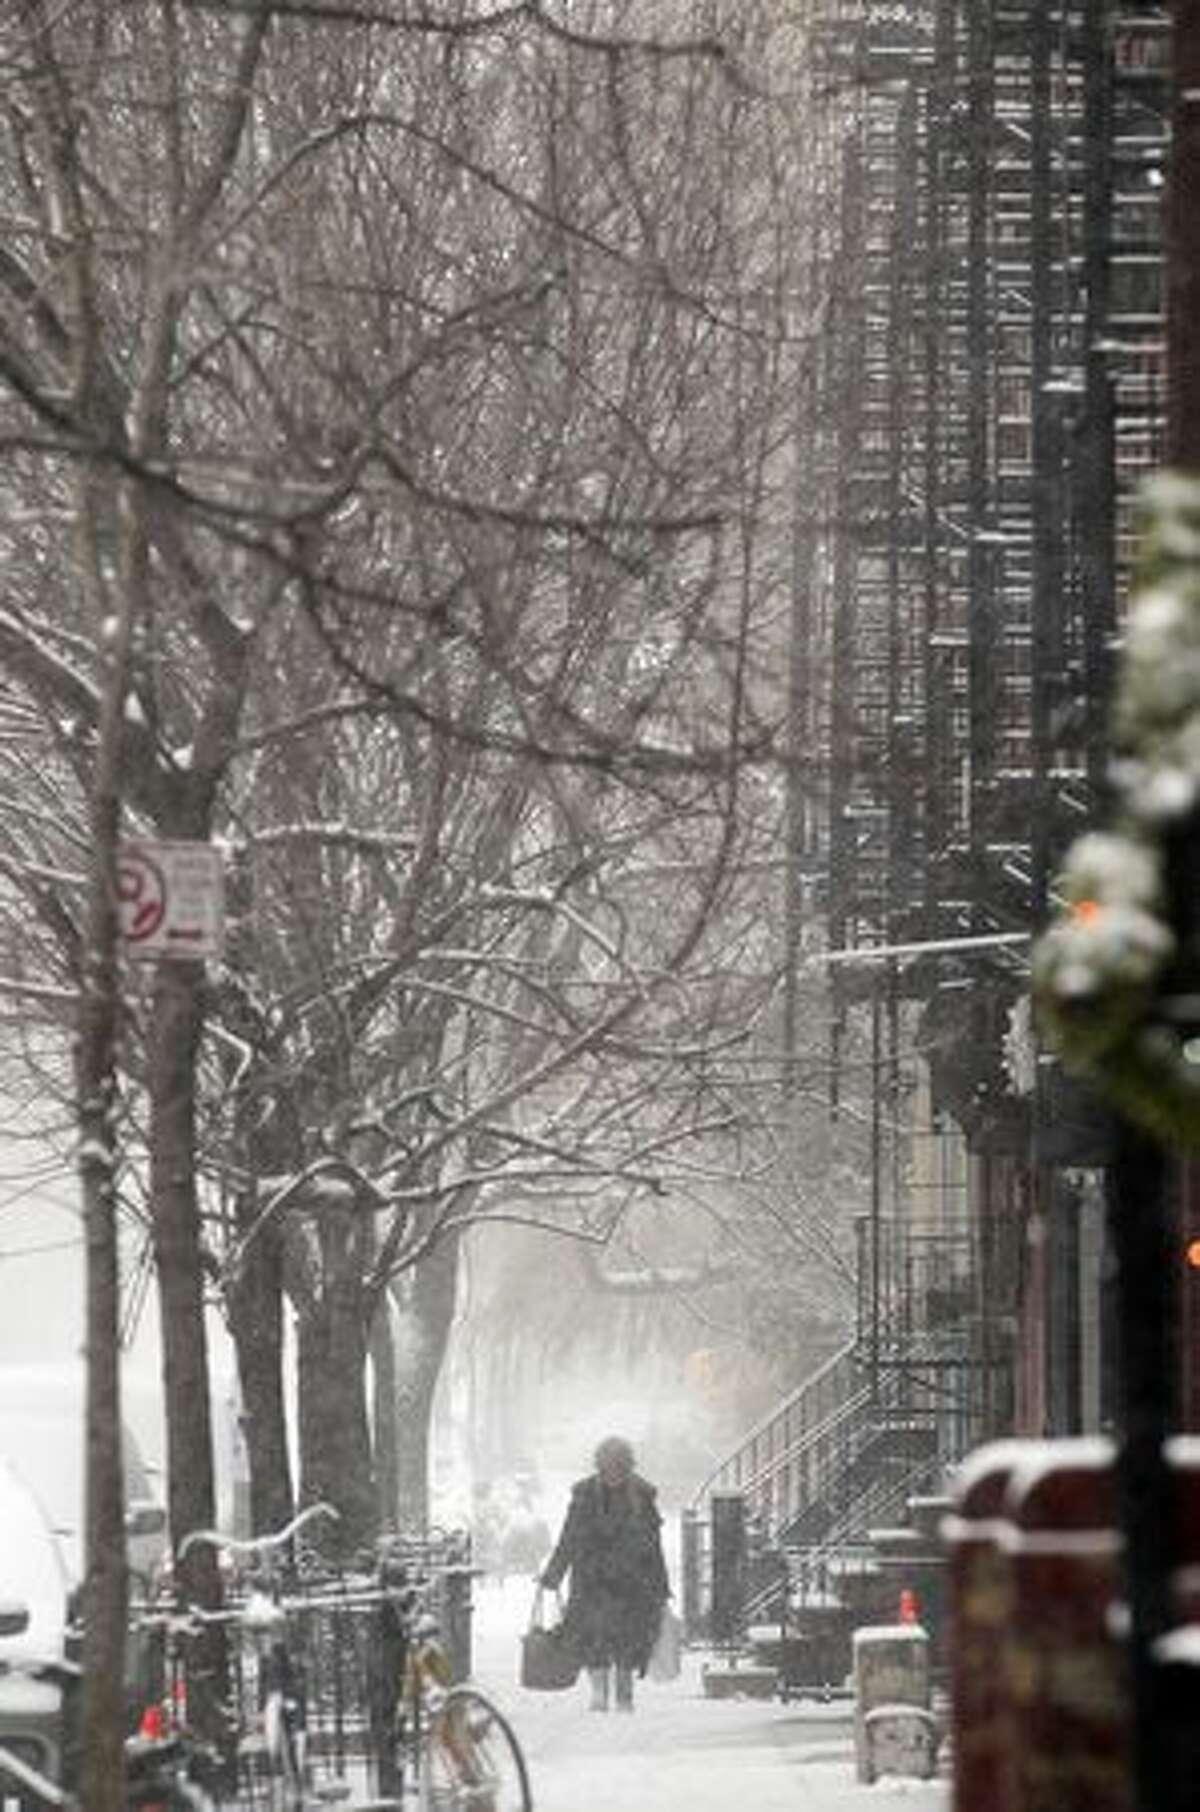 A woman walks through the snow in Manhattan's East Village in New York City.